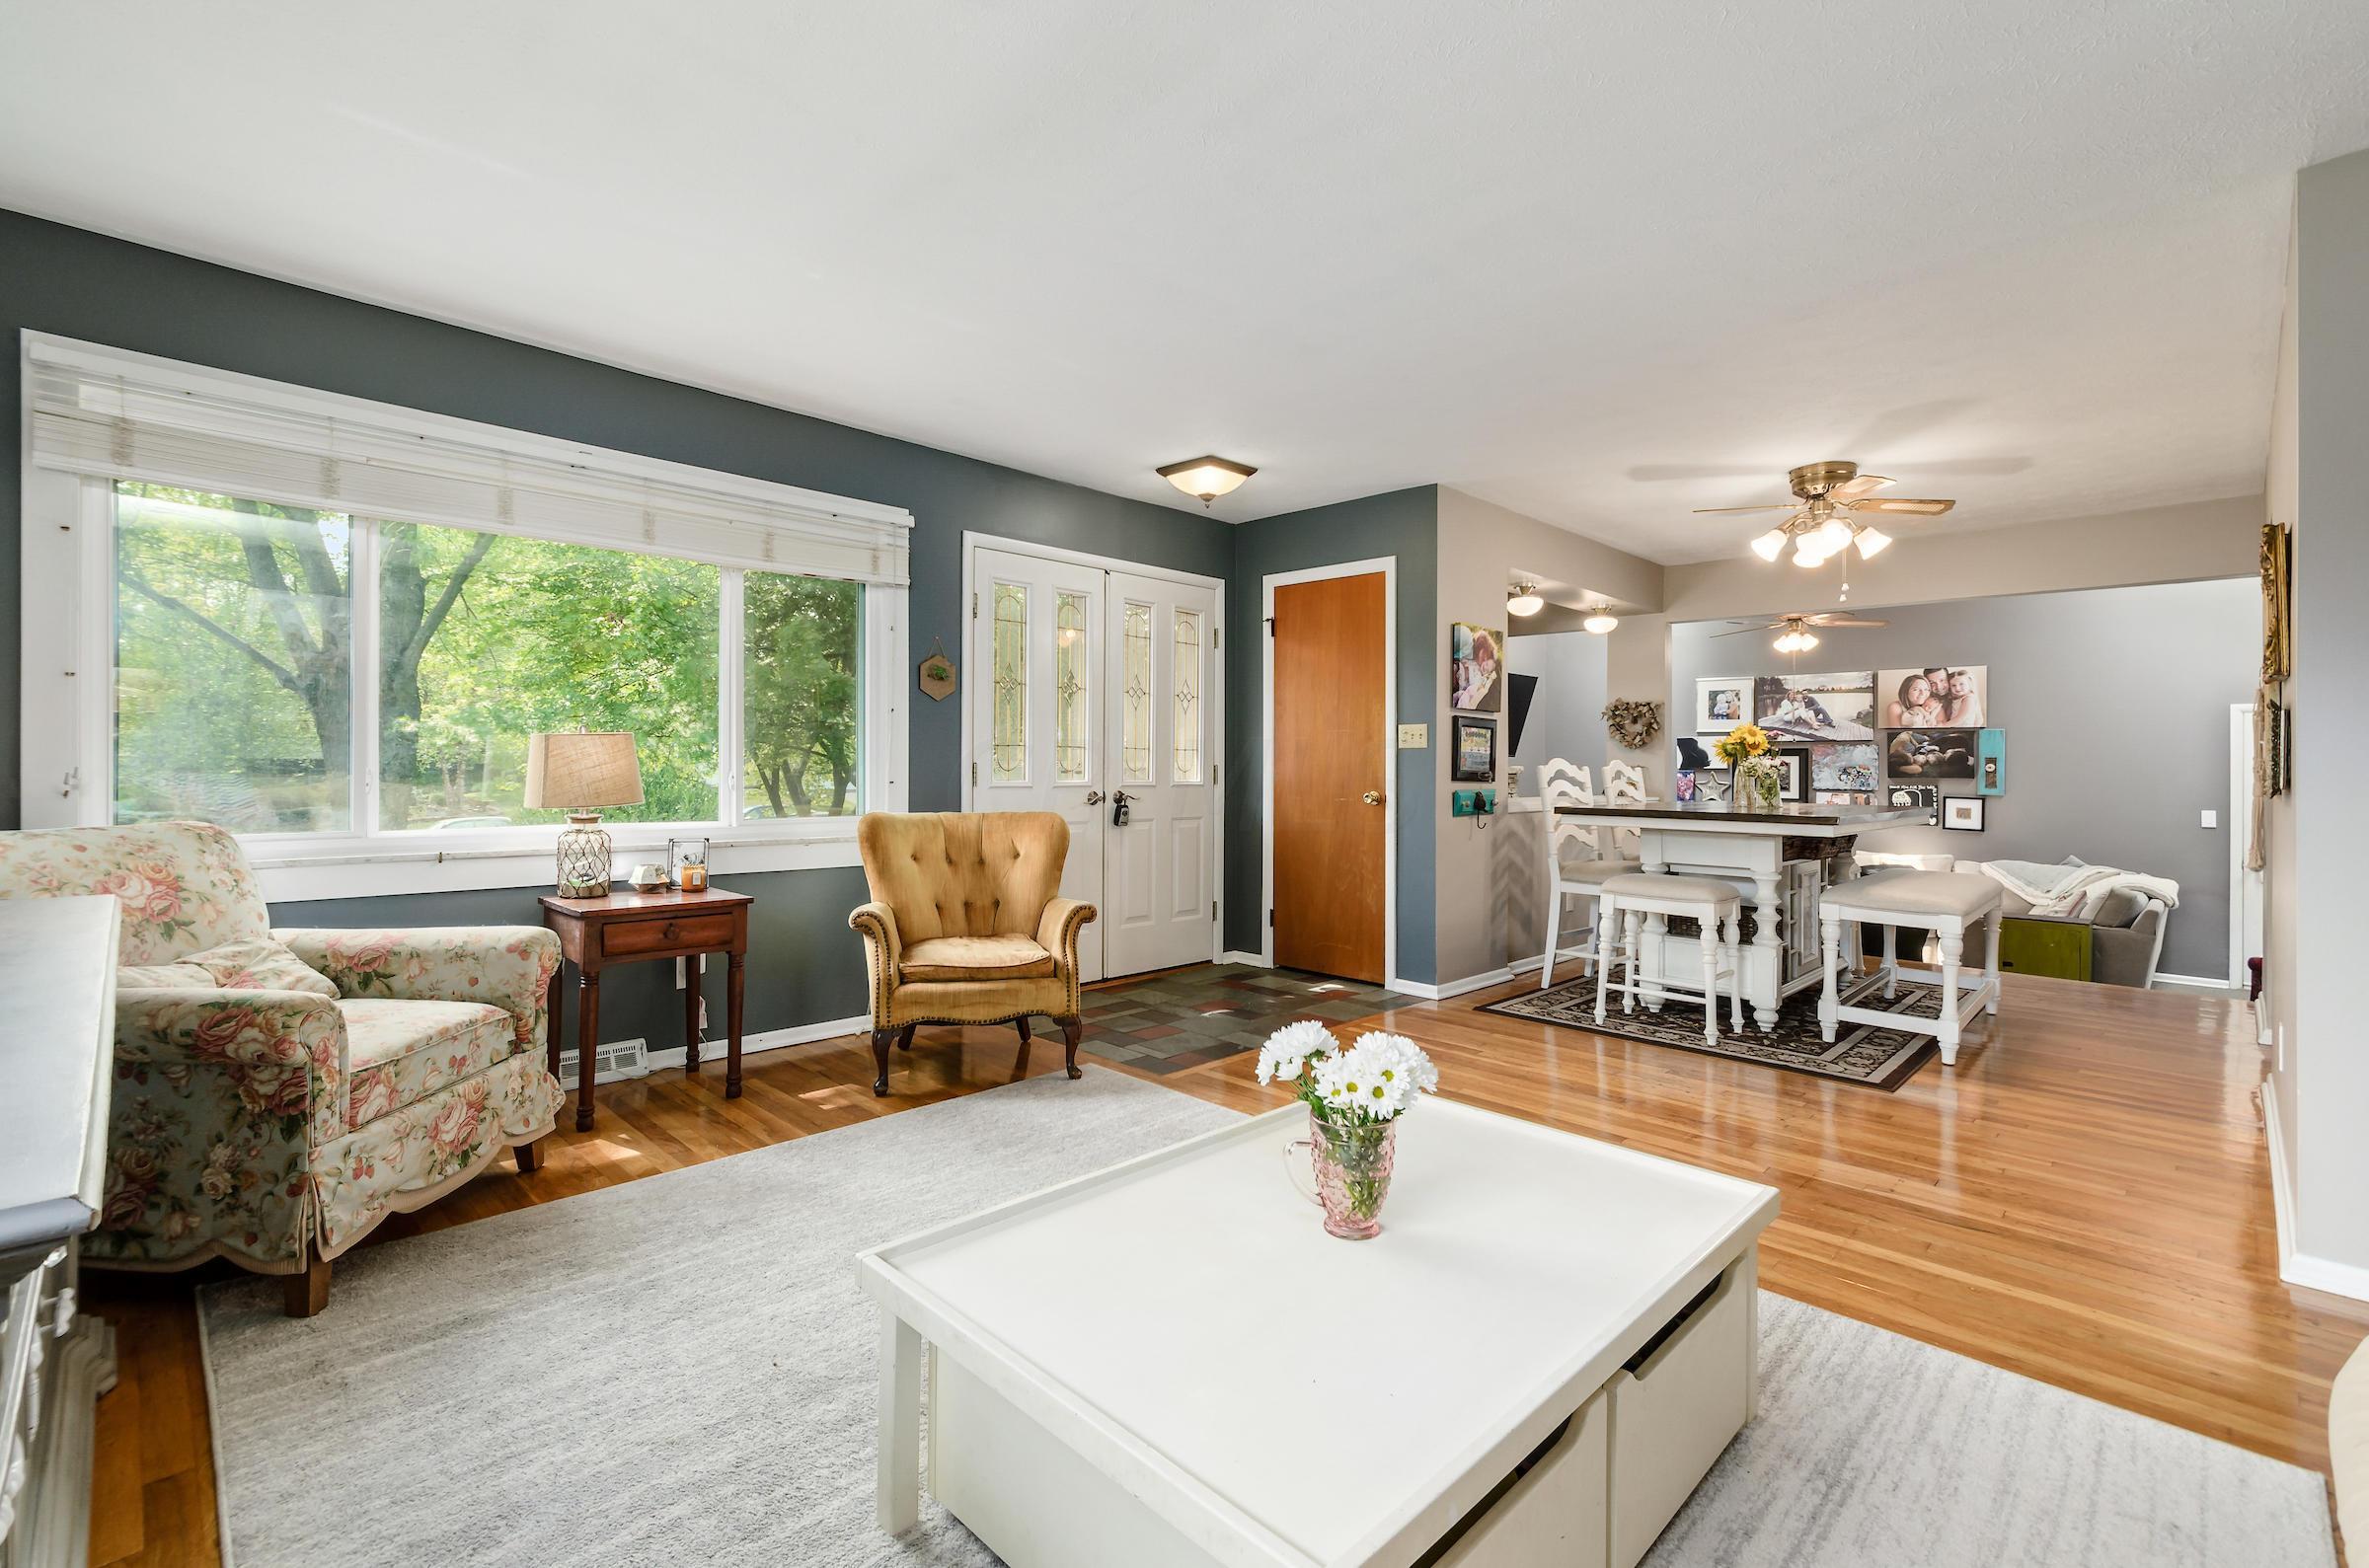 3784 Ridgewood Drive, Hilliard, Ohio 43026, 3 Bedrooms Bedrooms, ,2 BathroomsBathrooms,Residential,For Sale,Ridgewood,220031566